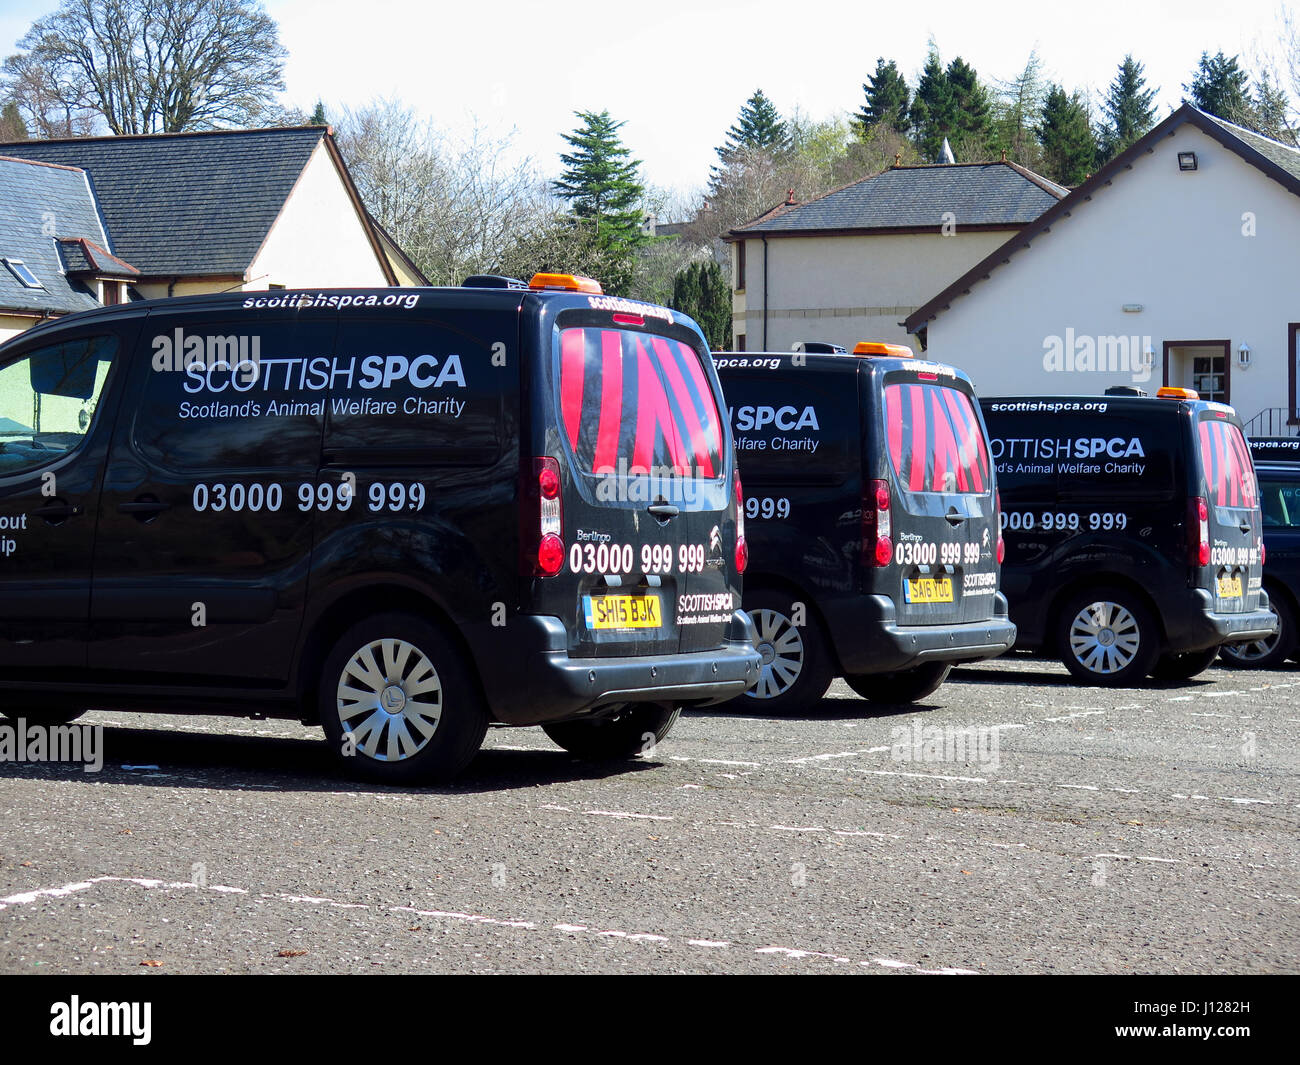 Scottish SPCA vans - Stock Image